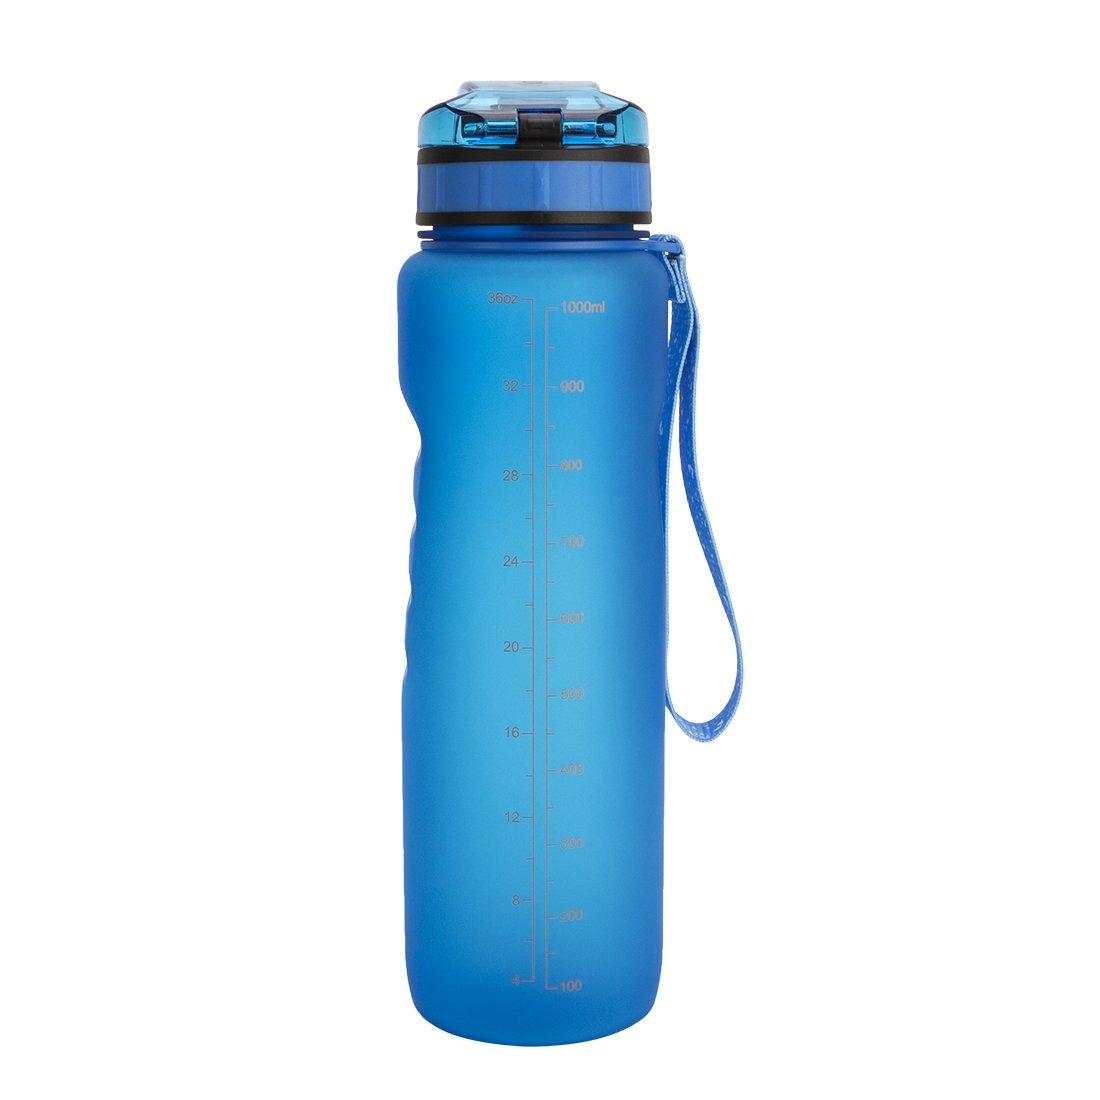 Travel Water Bottle Wide Mouth Flip Top Lid Water Jug BPA Free 22 oz // 28 oz // 36 oz Toplor Big Capacity Sports Fitness Water Bottle Portable Travel Water Bottle